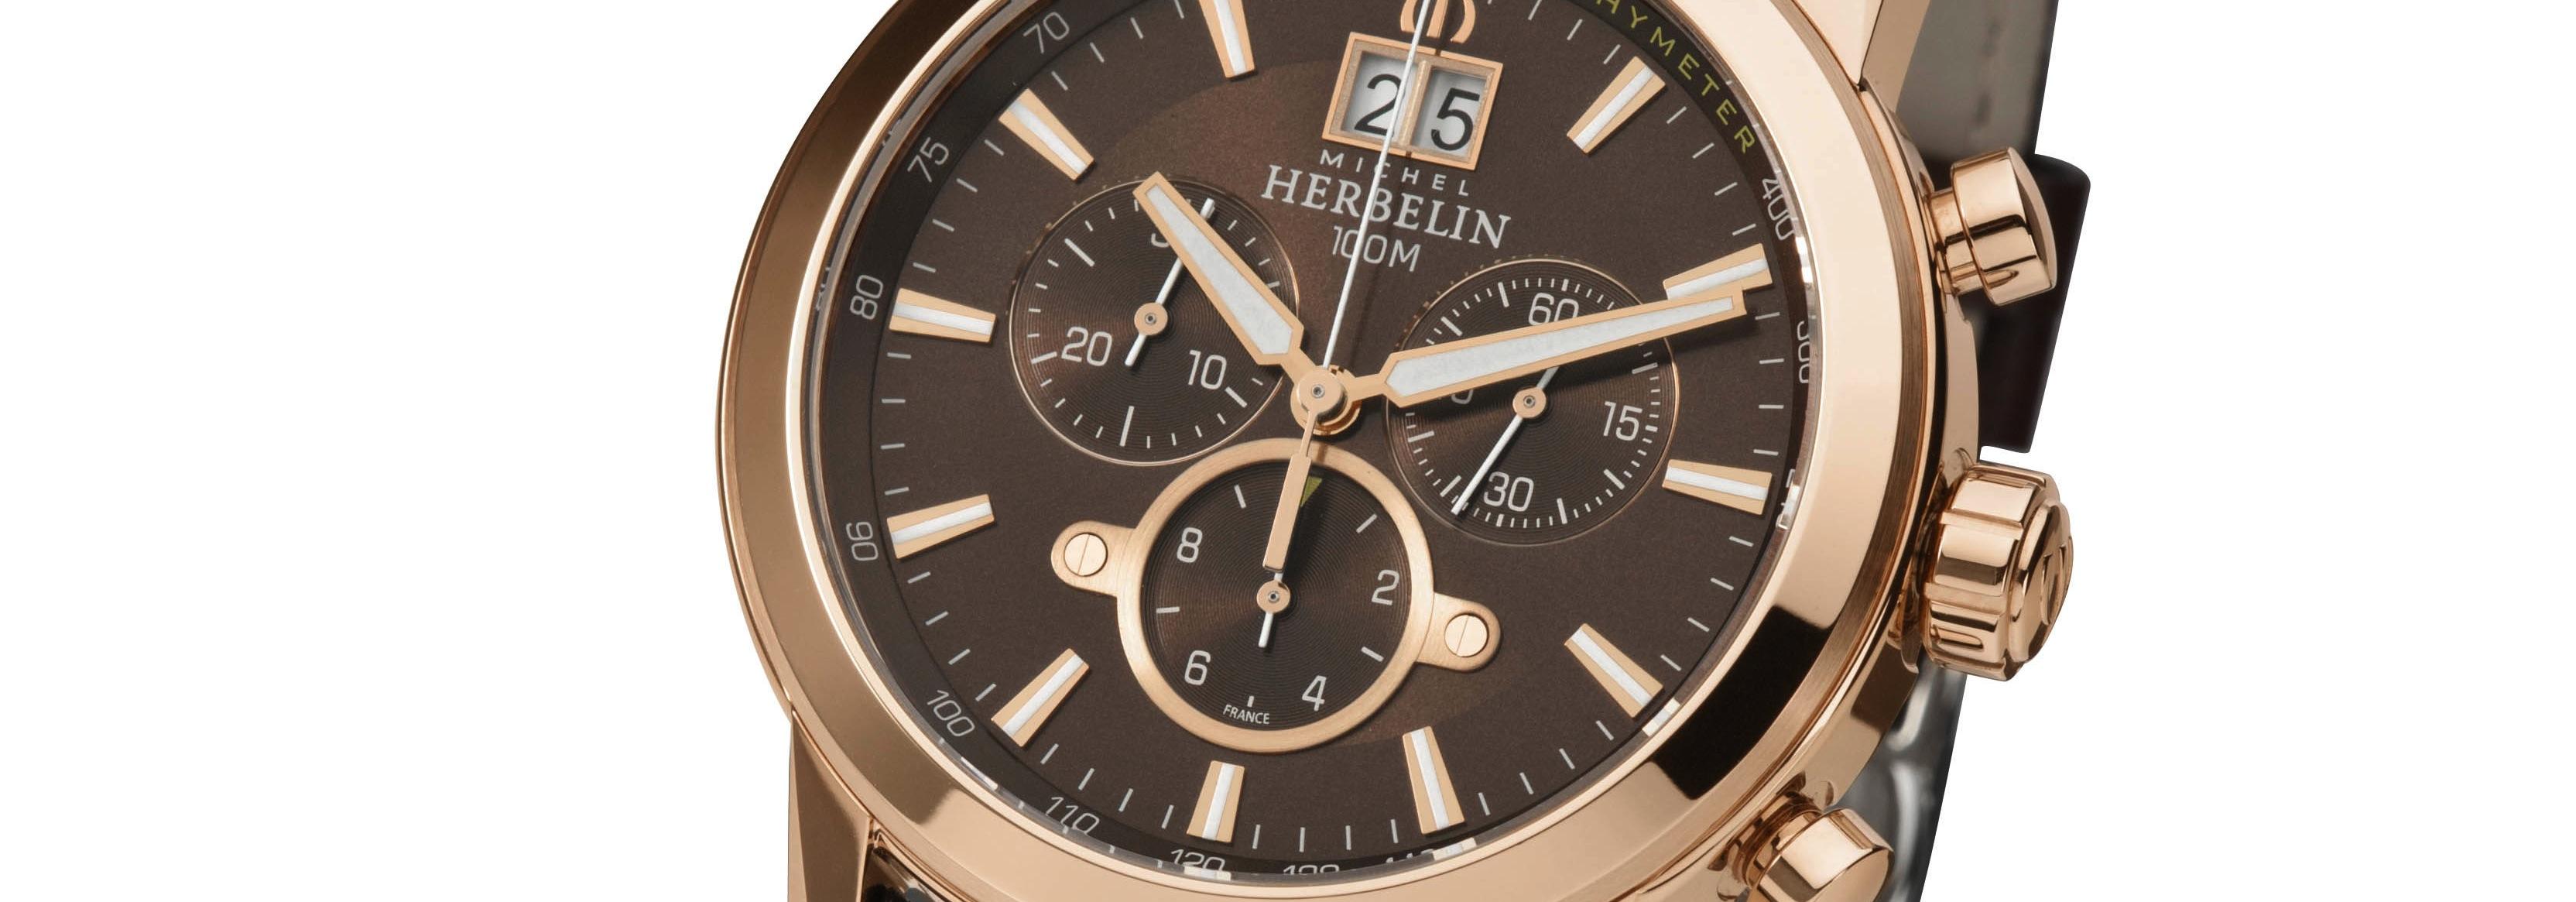 Michel Herbelin Classic Chronograph